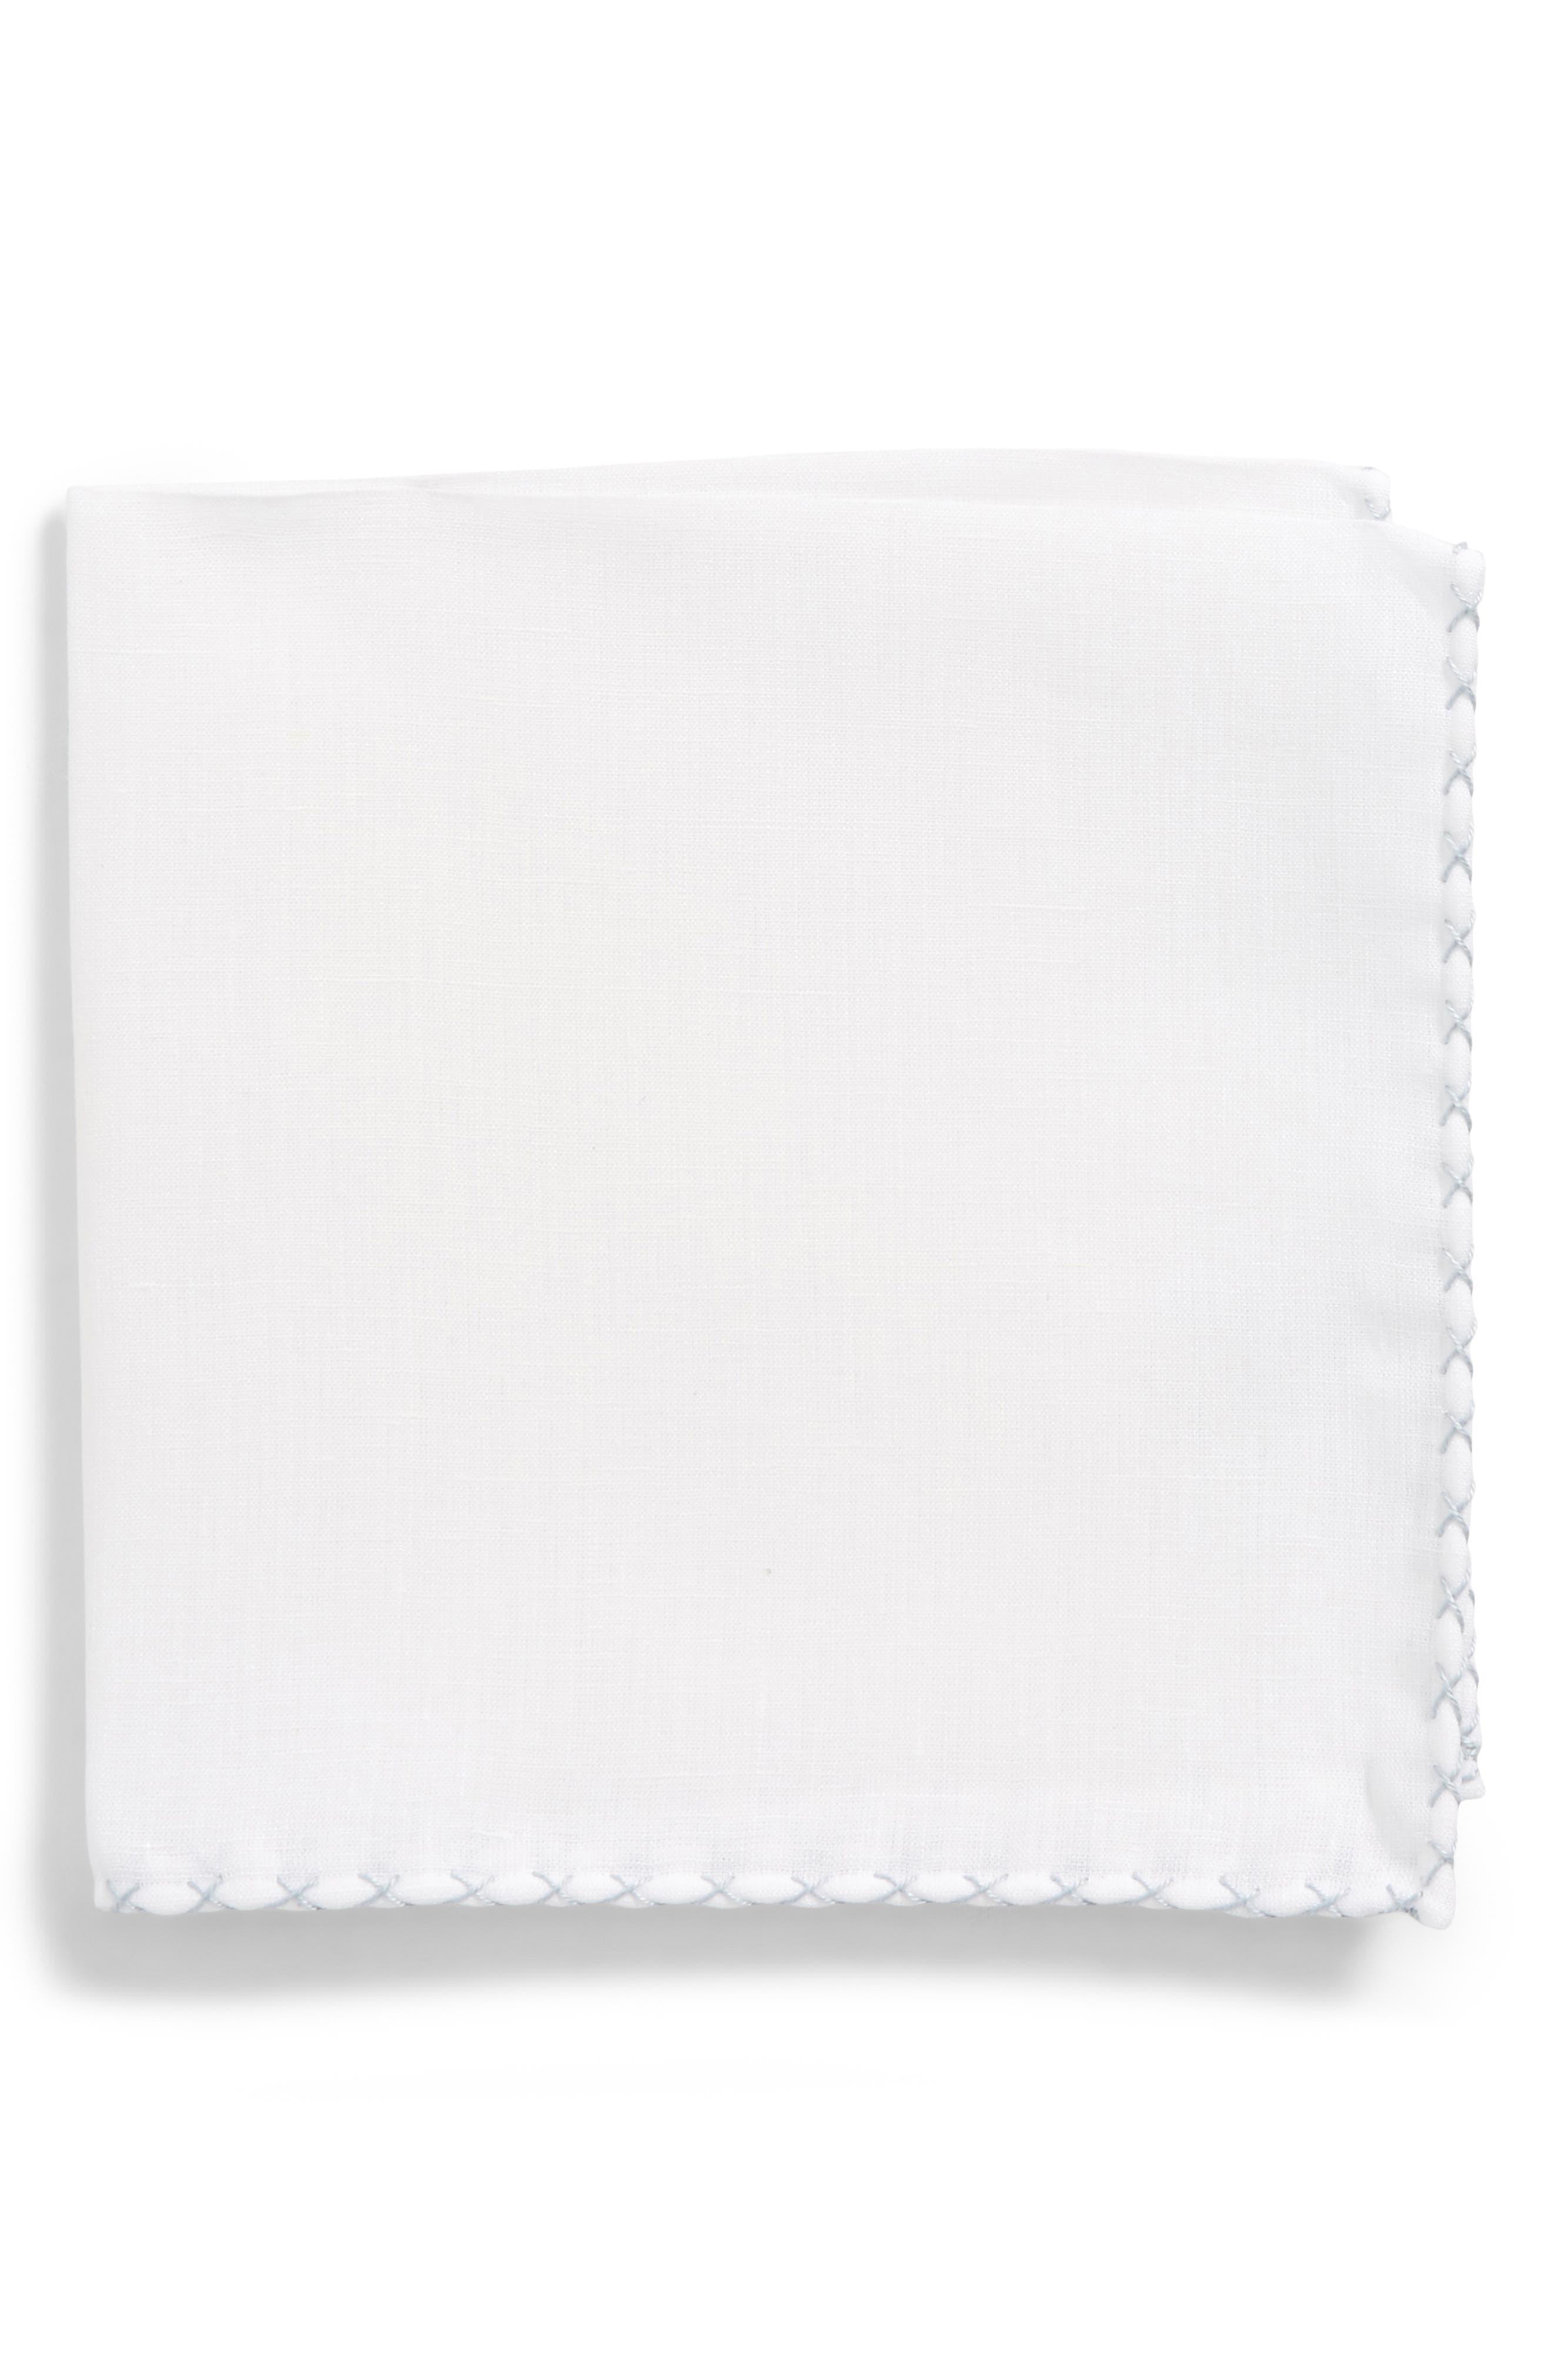 Solid Linen Pocket Square,                             Main thumbnail 1, color,                             WHITE/ STONE